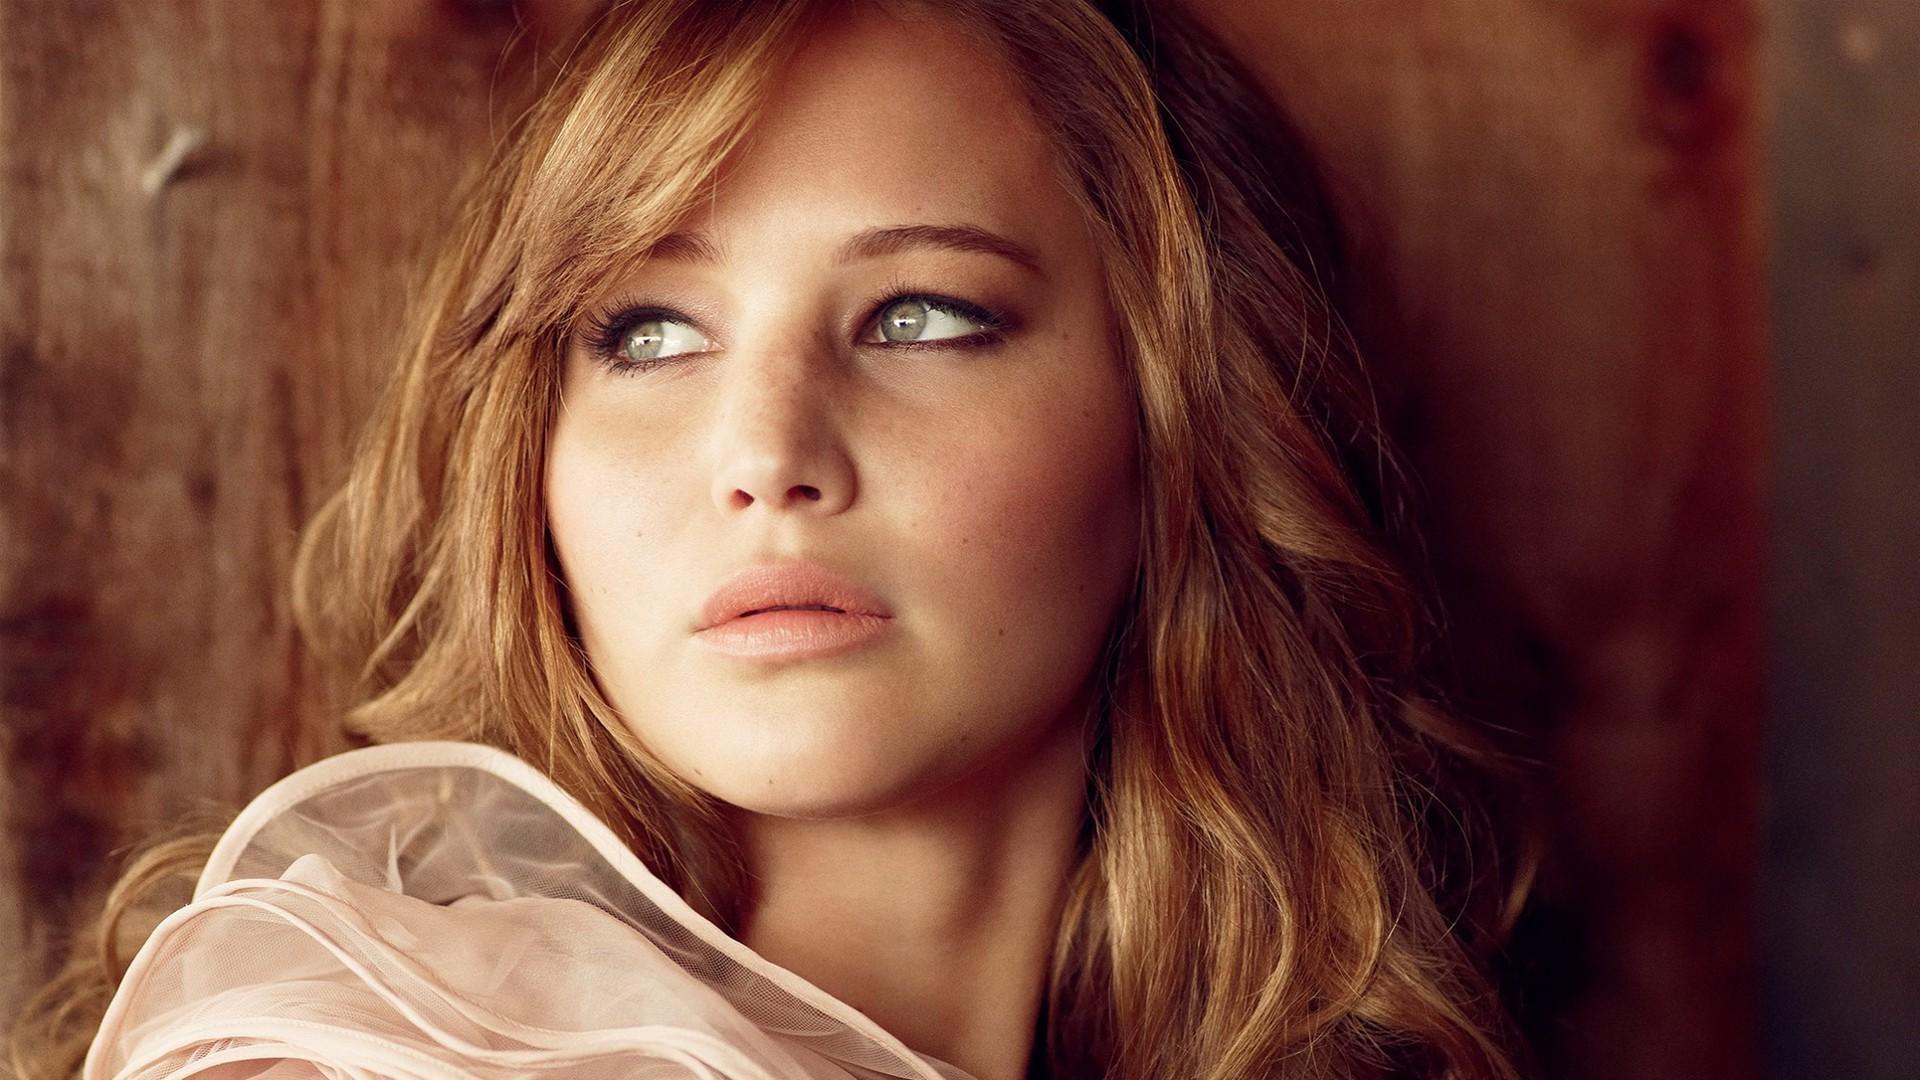 Wallpaper Face Women Blonde Long Hair Red Green Eyes Actor